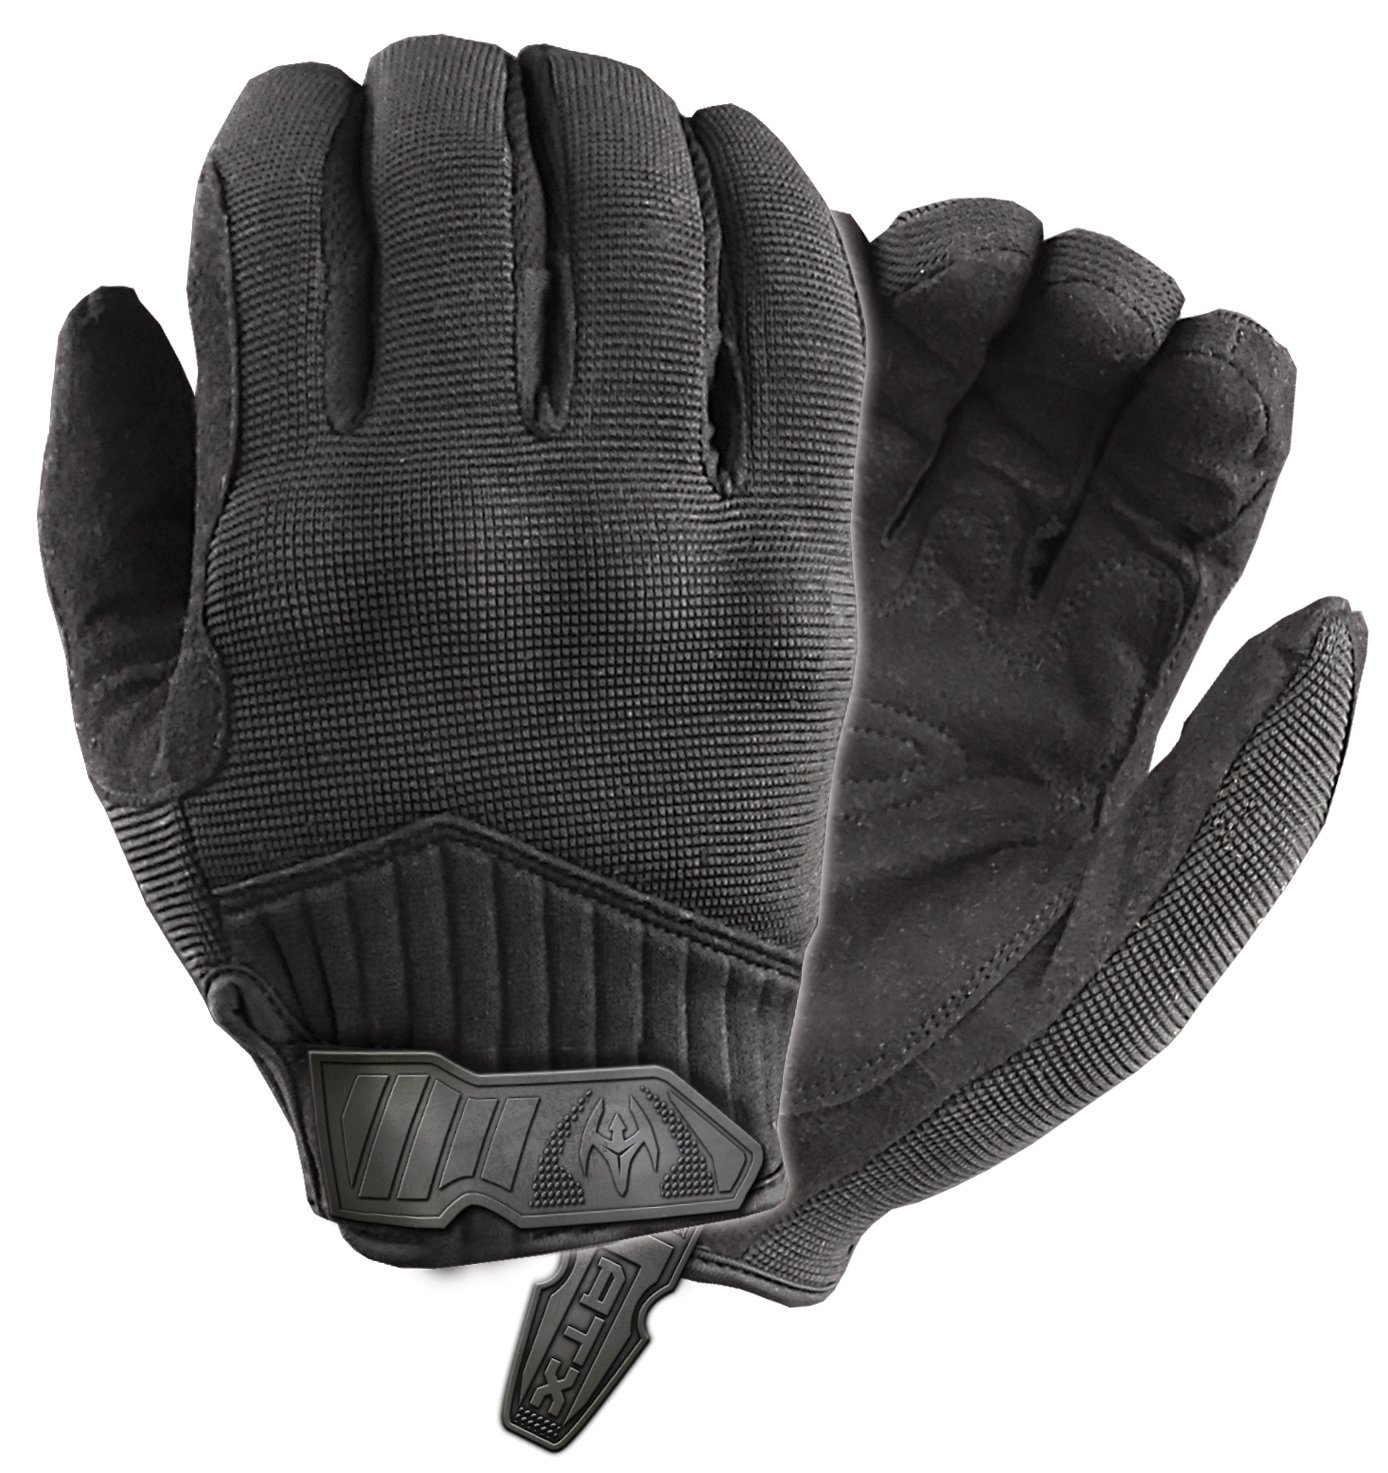 Damascus ATX65 Unlined Hybrid Duty Gloves, Large